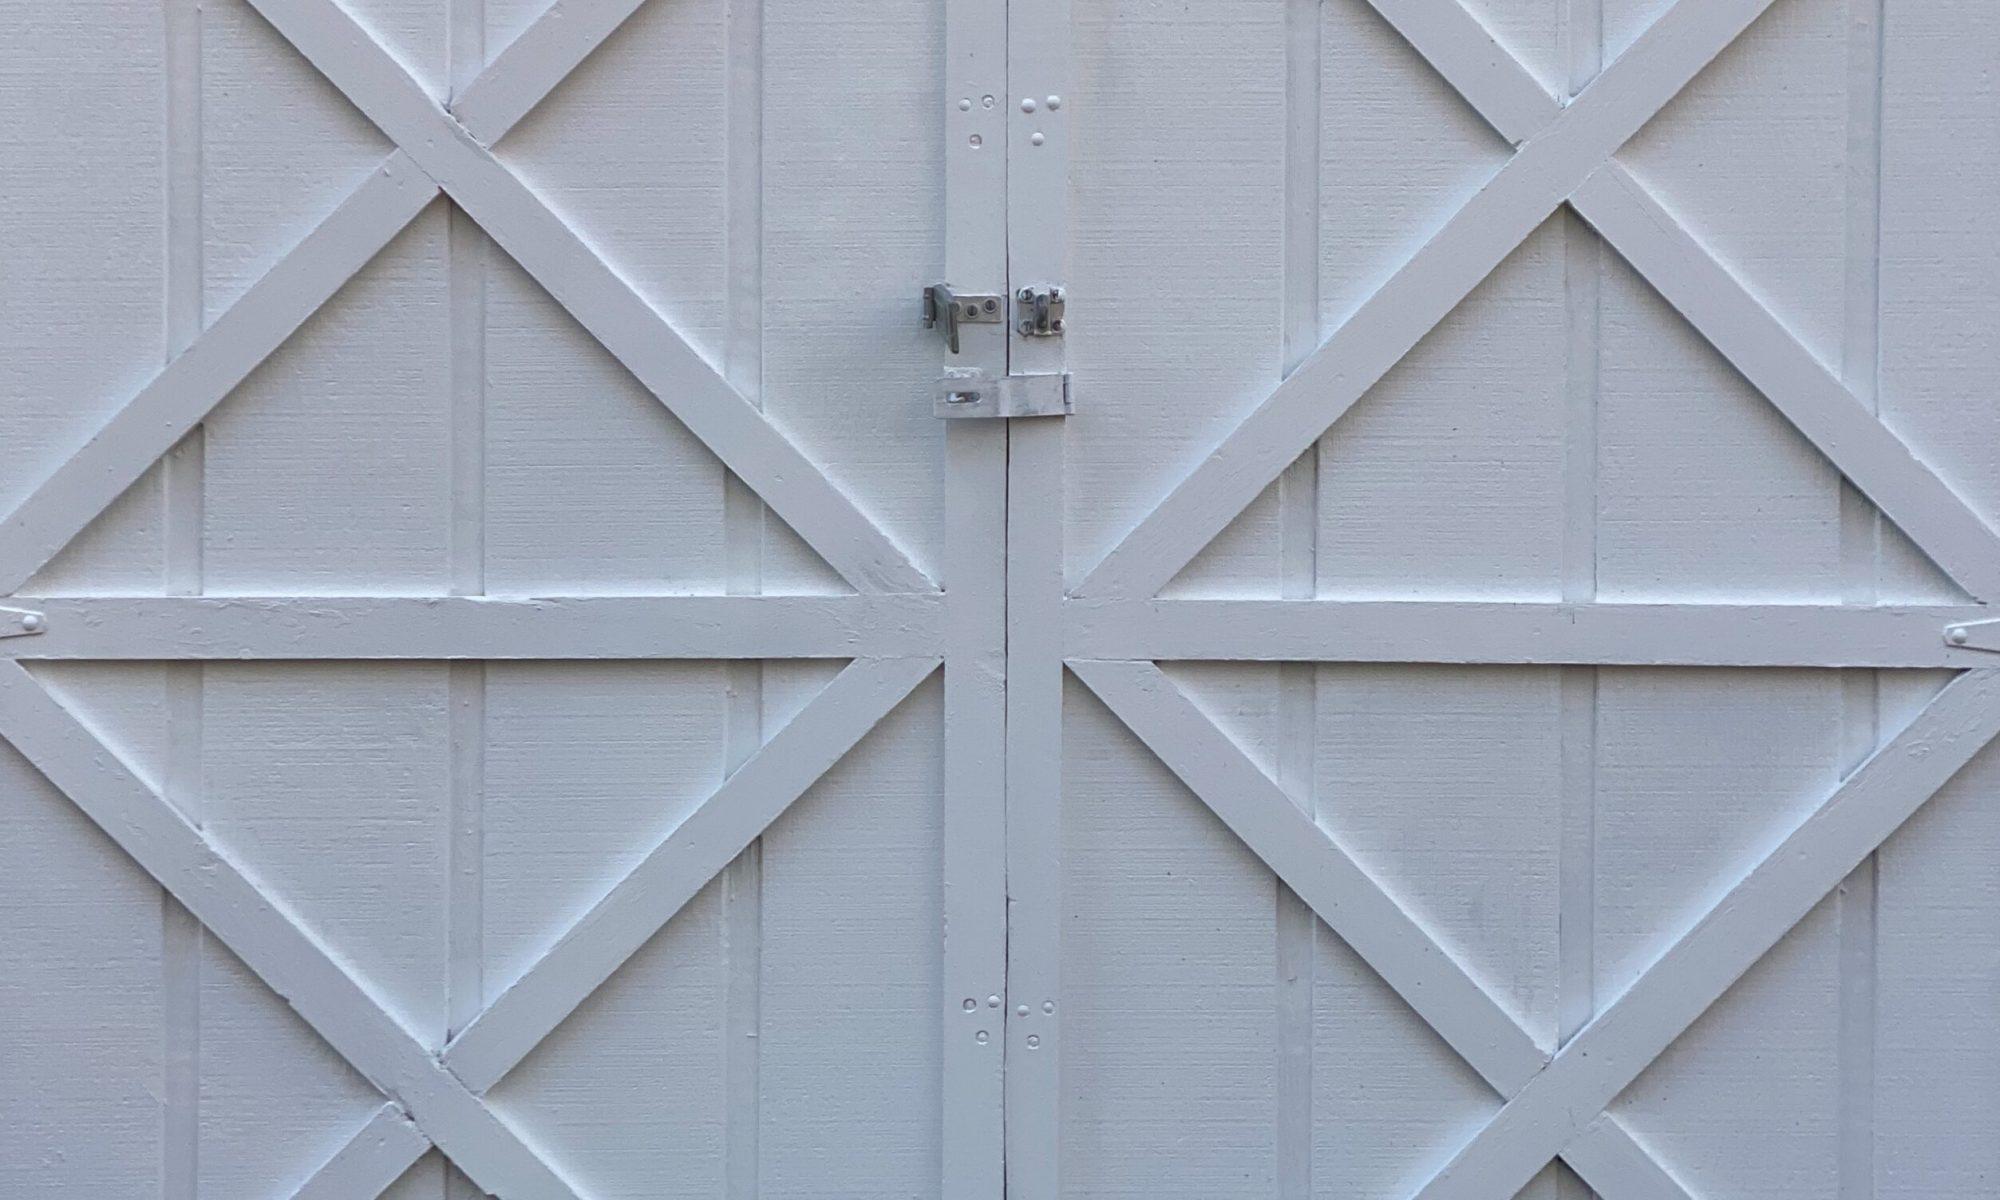 Closed Barn Doors on 2020